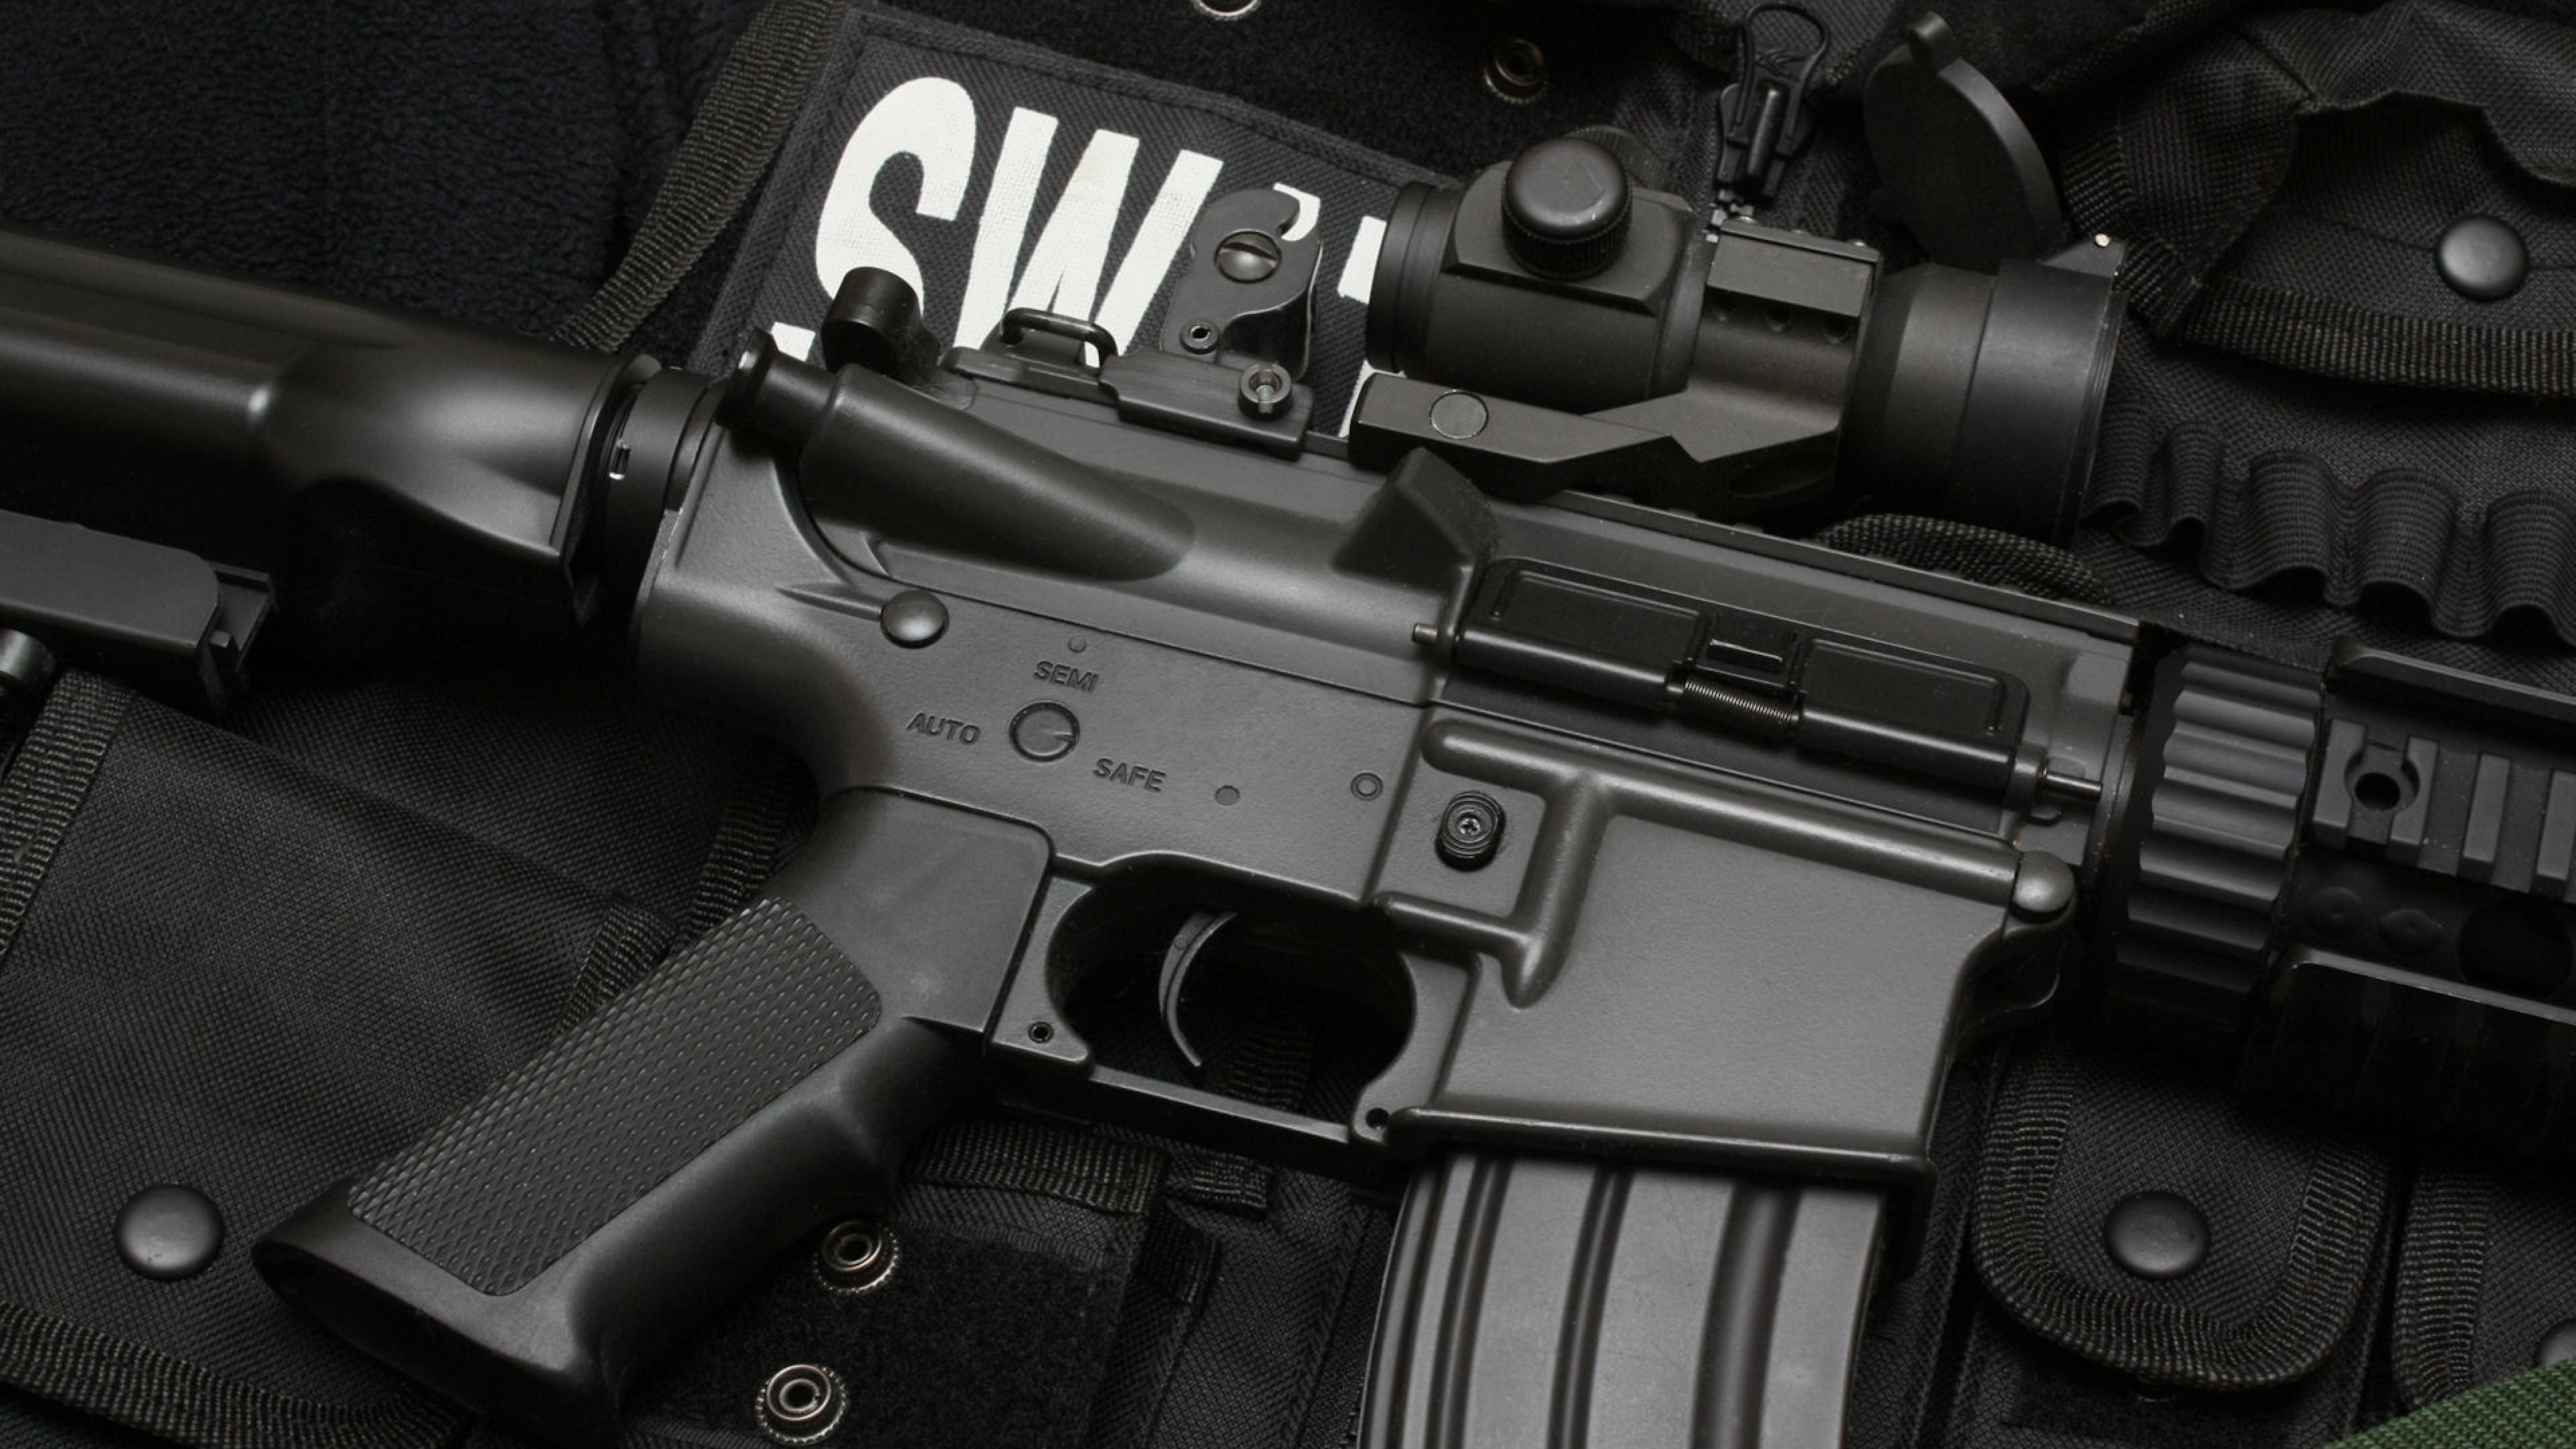 7680x4320 Swat Submachine Gun Bulletproof Vest 8k